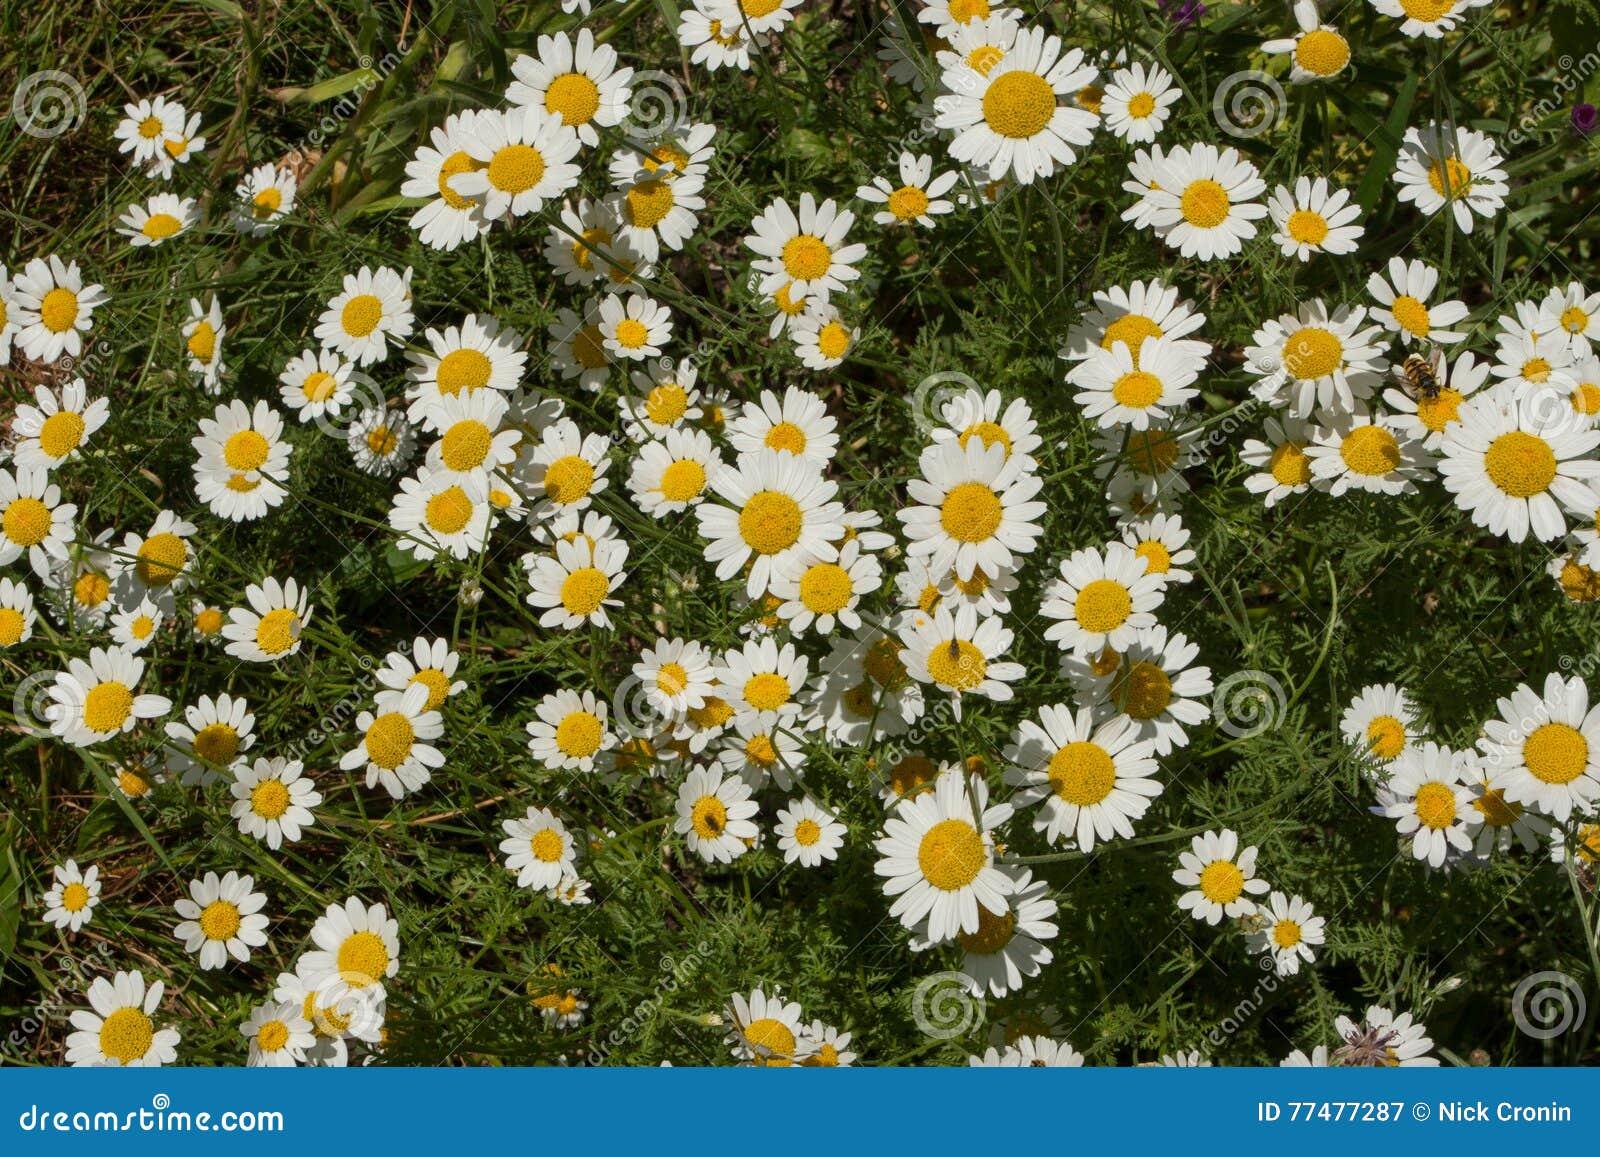 Plant life 95 stock image image of pyrethrum yellow 77477287 download comp izmirmasajfo